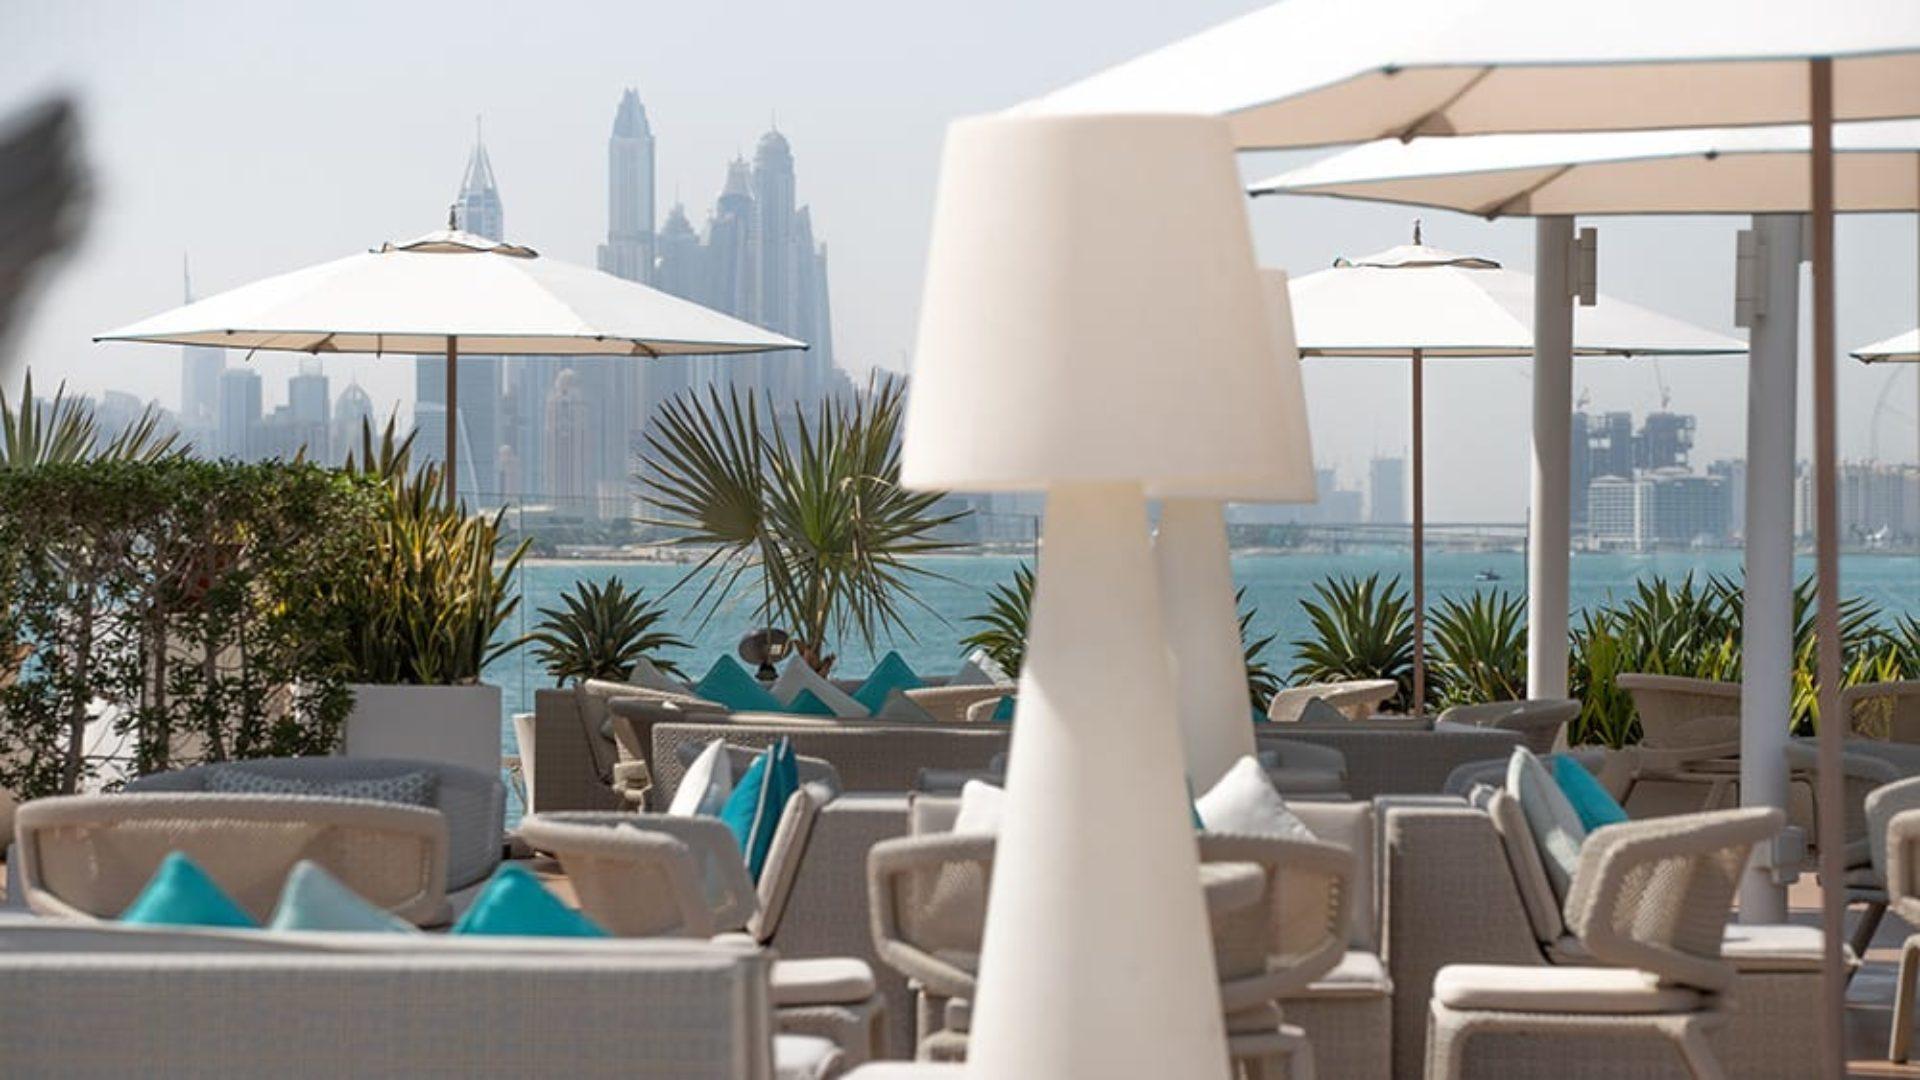 View of Dubai from the pool terrace at the Burj Al Arab